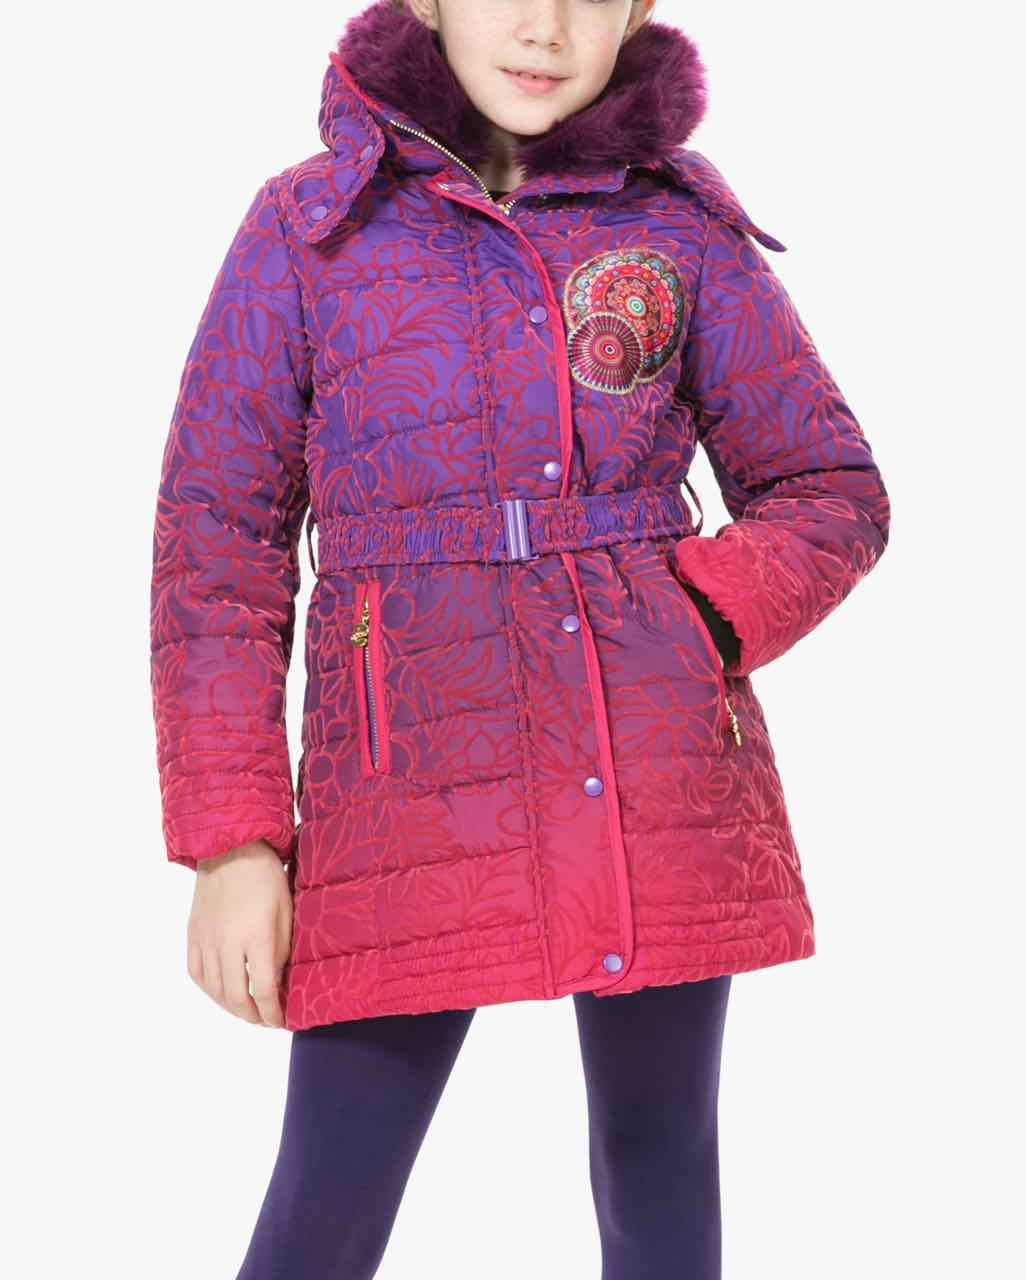 67E34B1_3125 Desigual Girl Coat Opuntia Buy Online